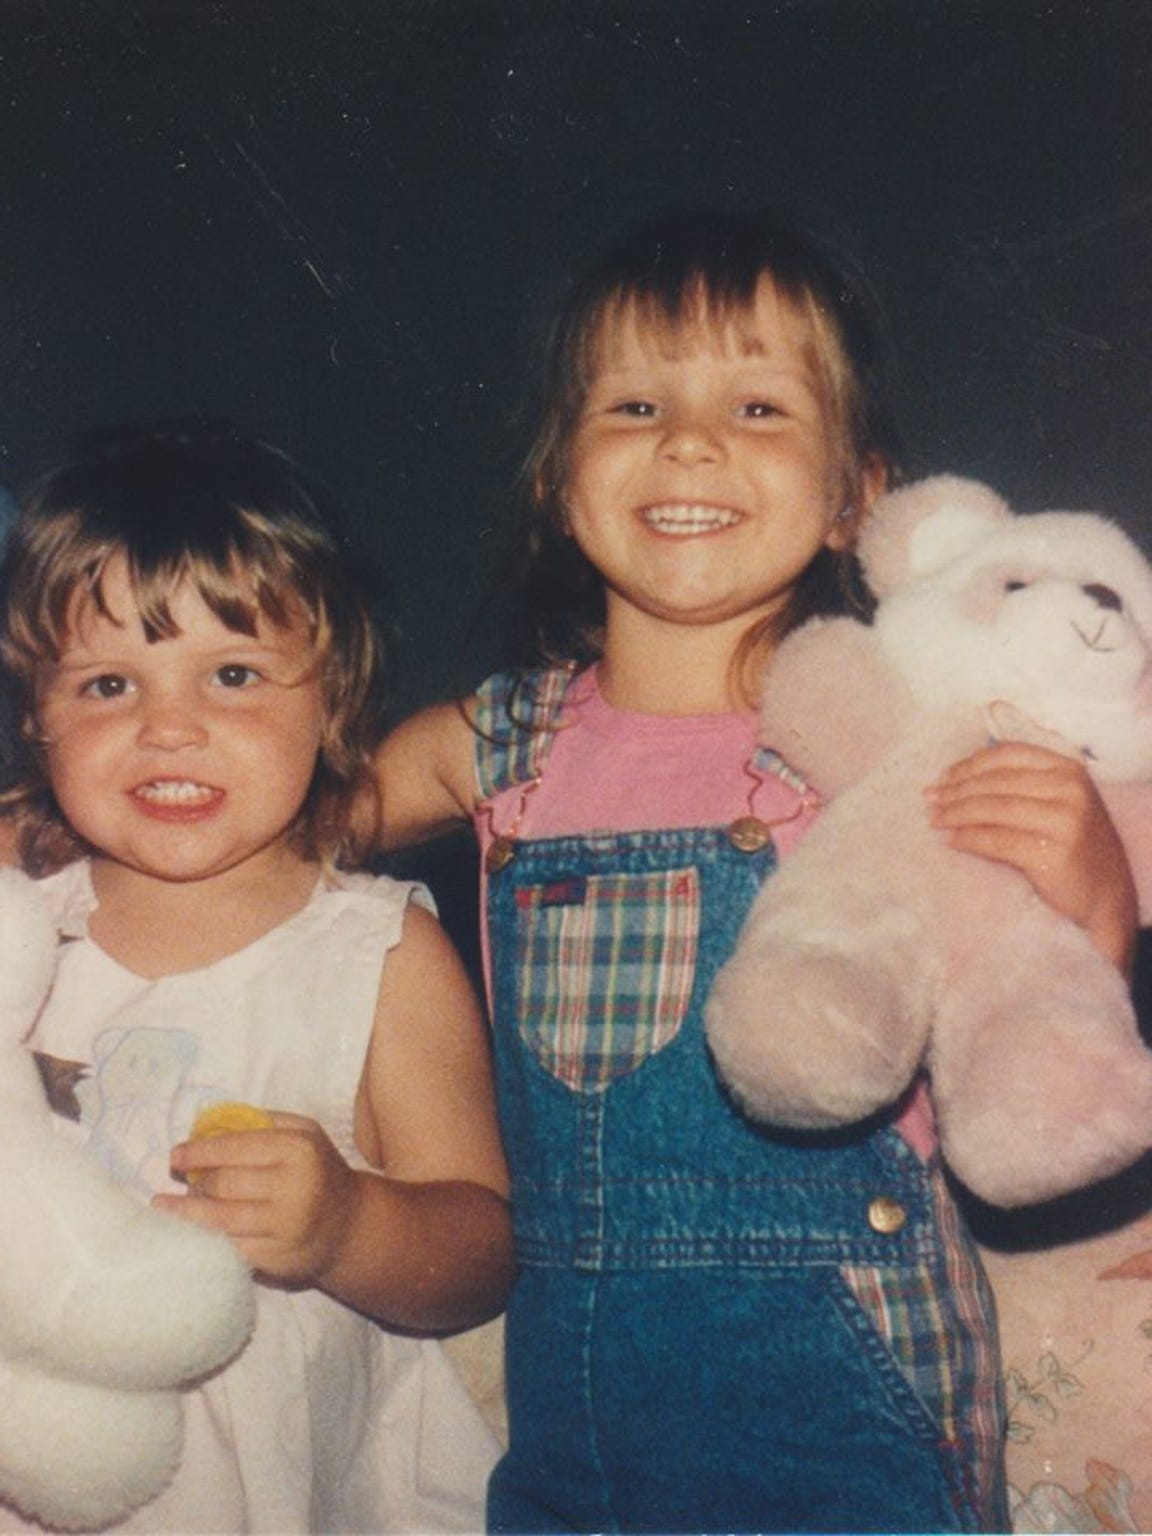 Heather Bogle, right, with sister Jennifer Bogle, when